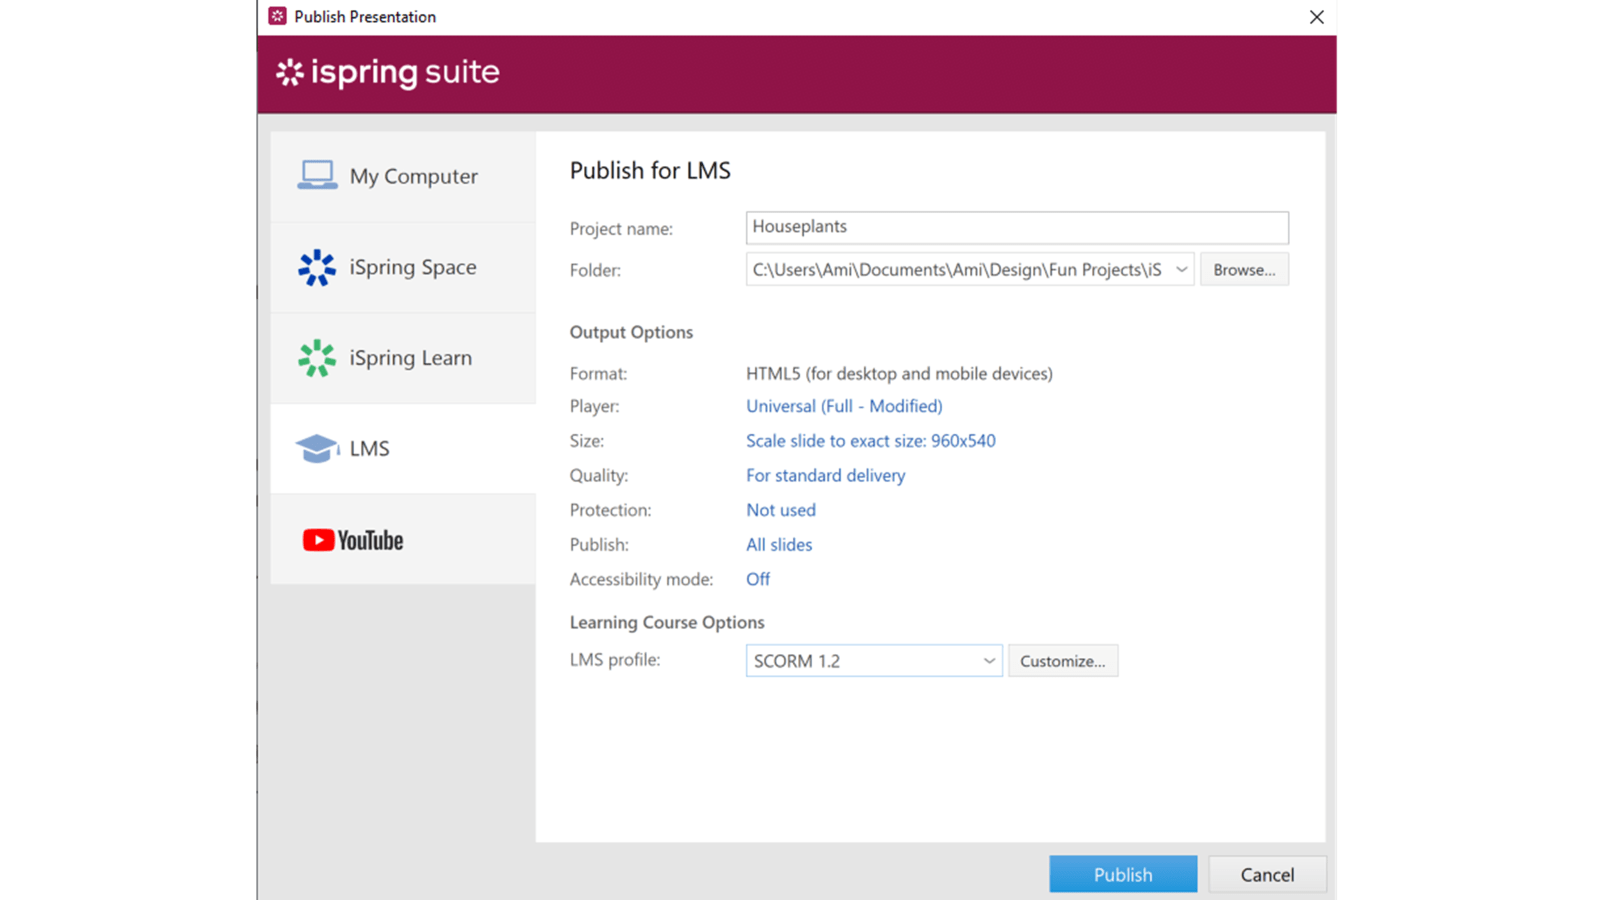 Screenshot of iSprings Publish Presentation window